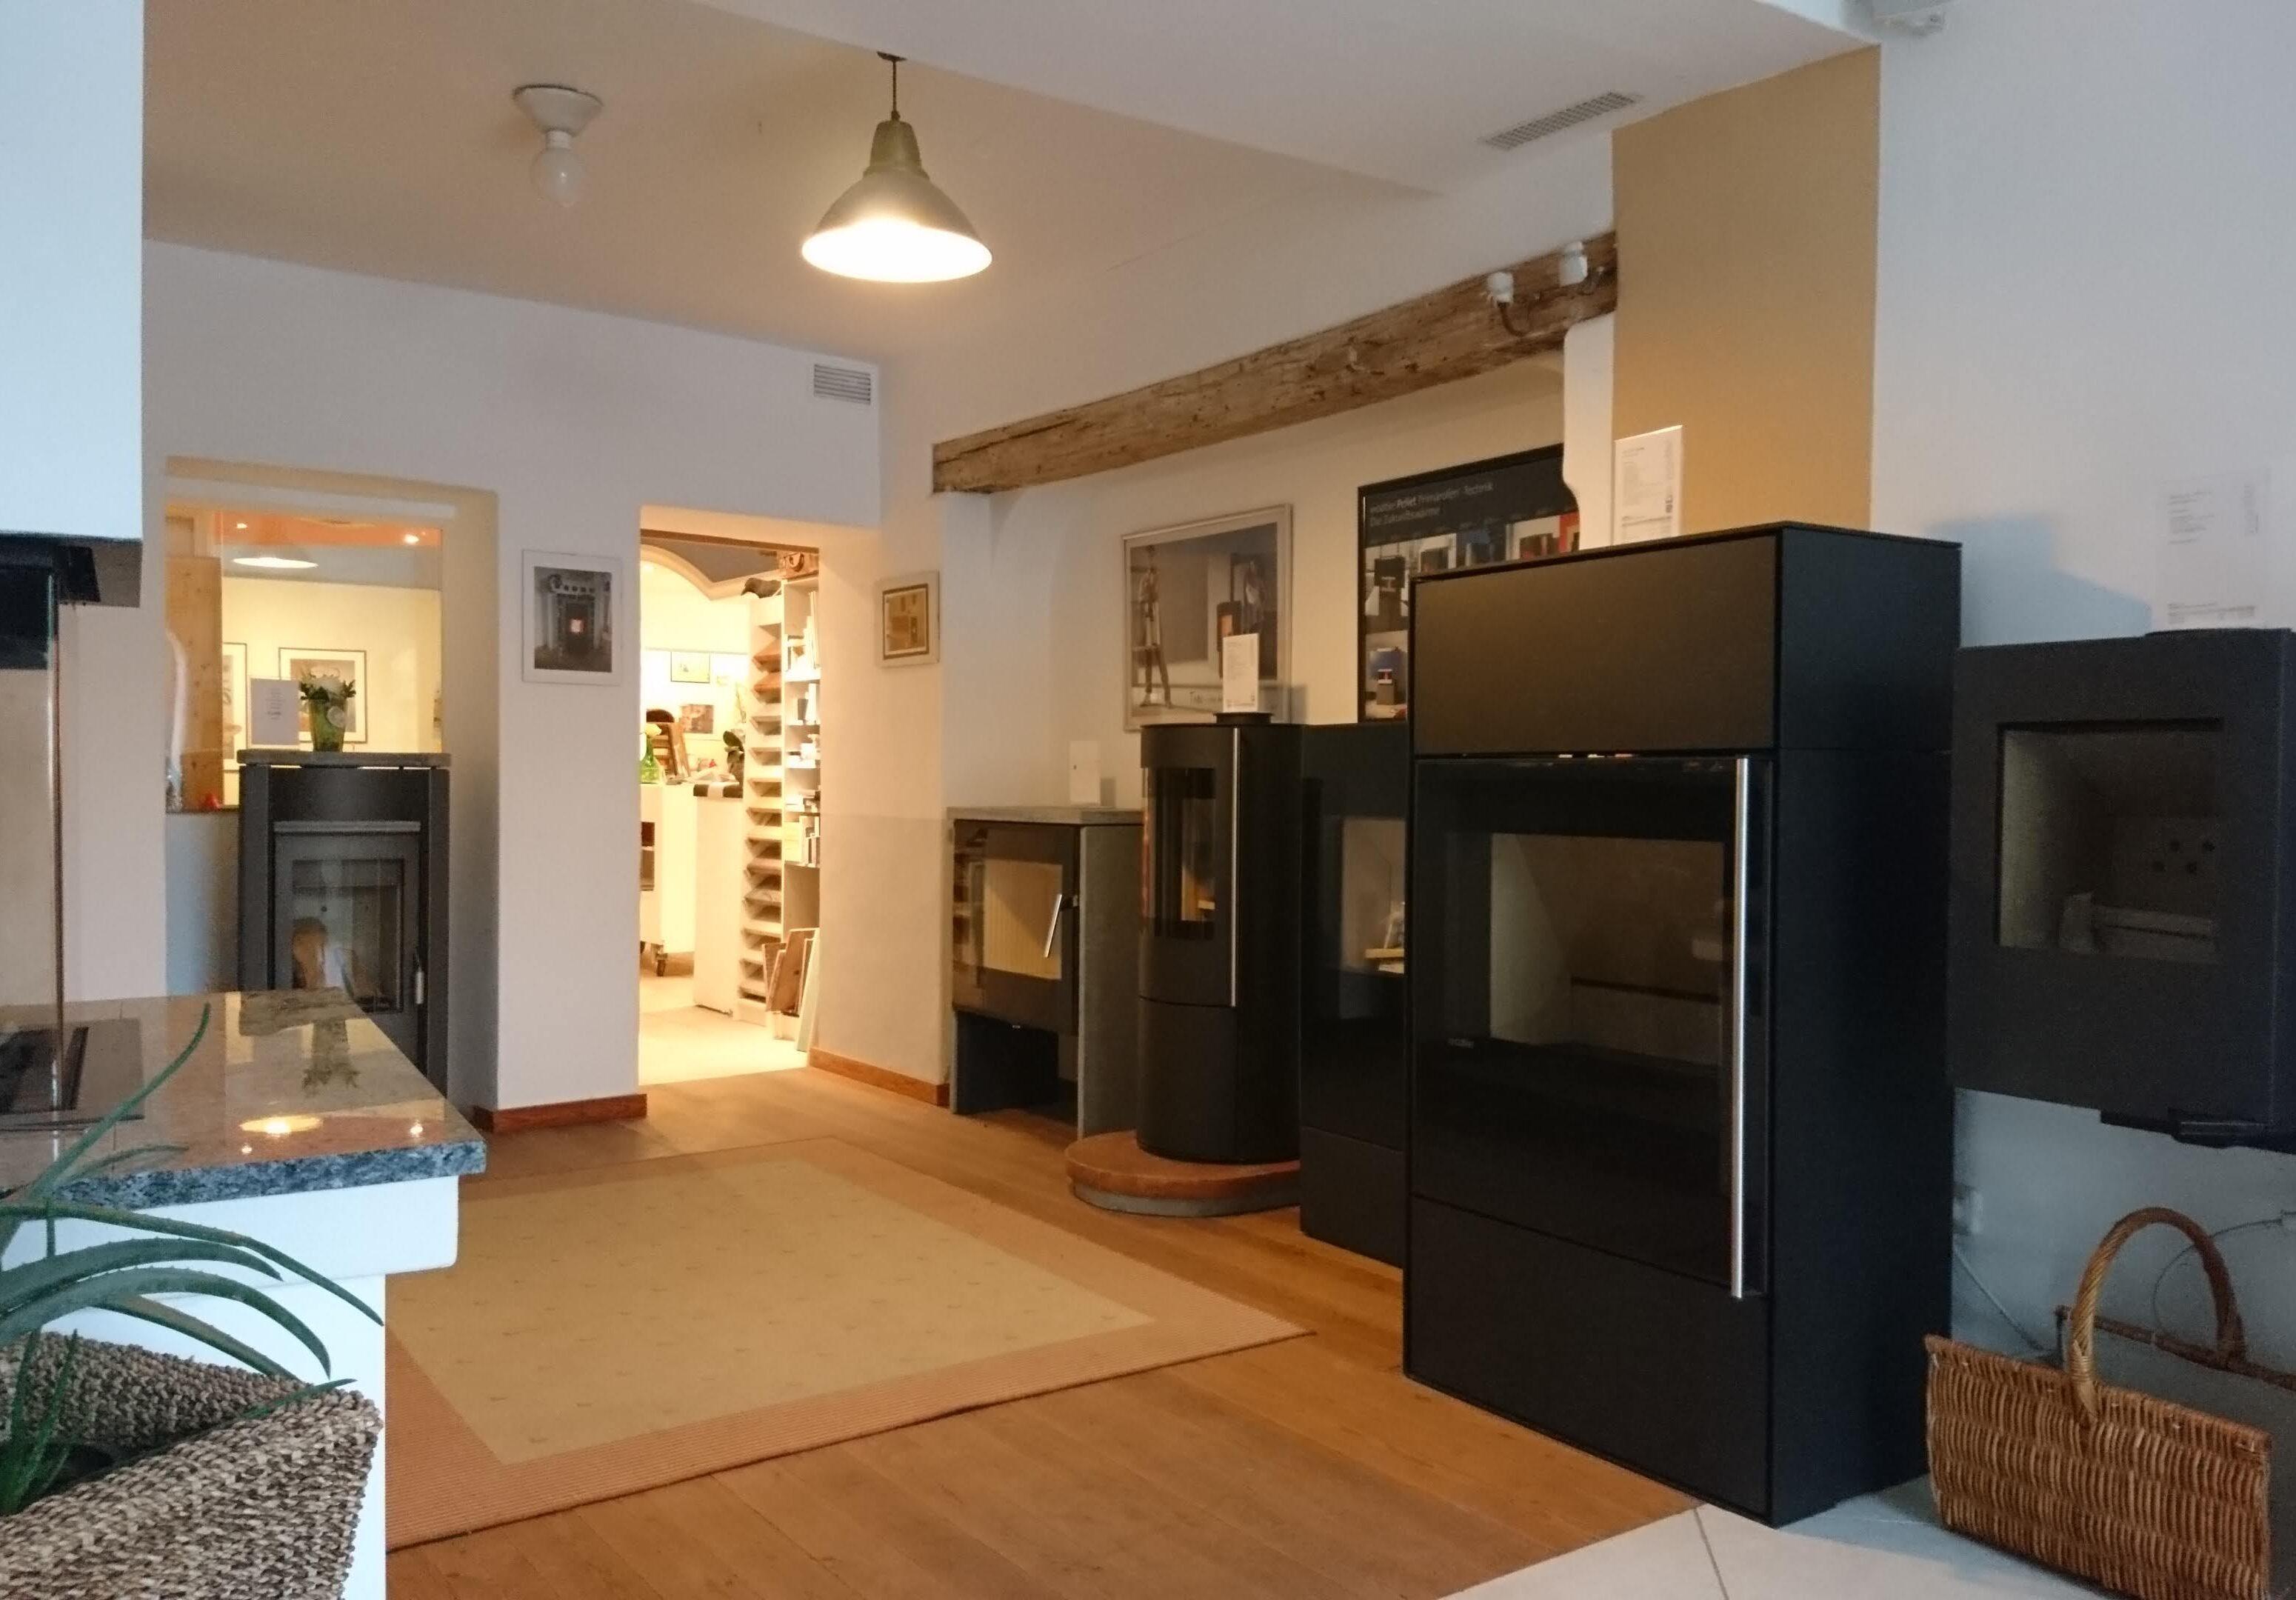 Kaminofen-Studio Ofenbau Weiss